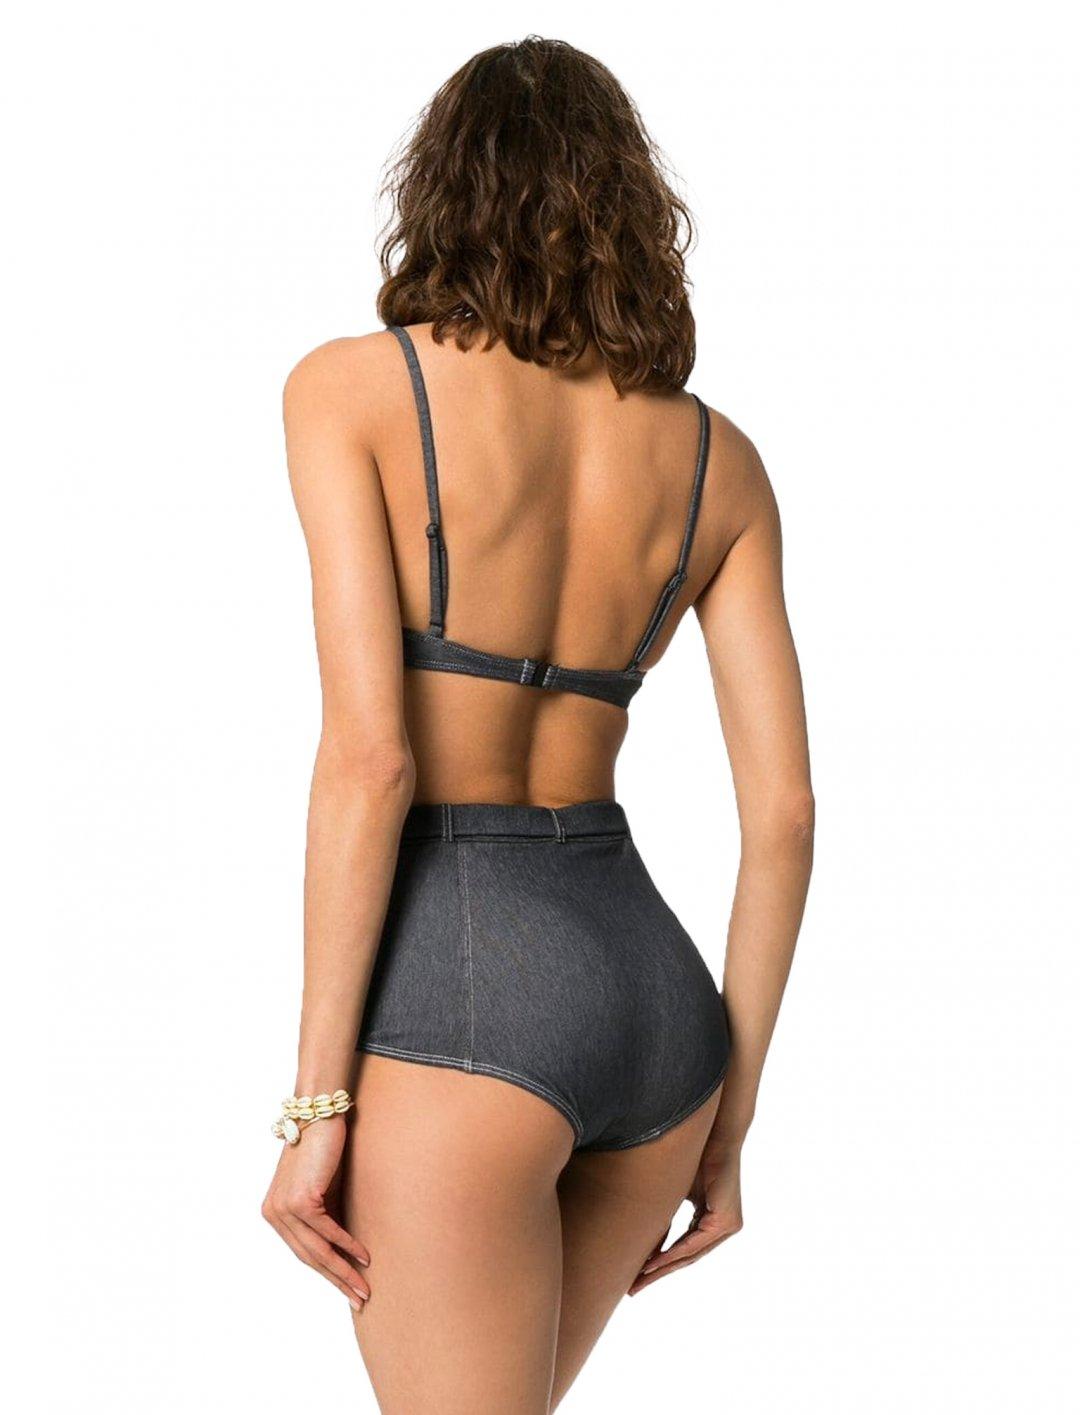 Denim Bikini Clothing Solid & Striped